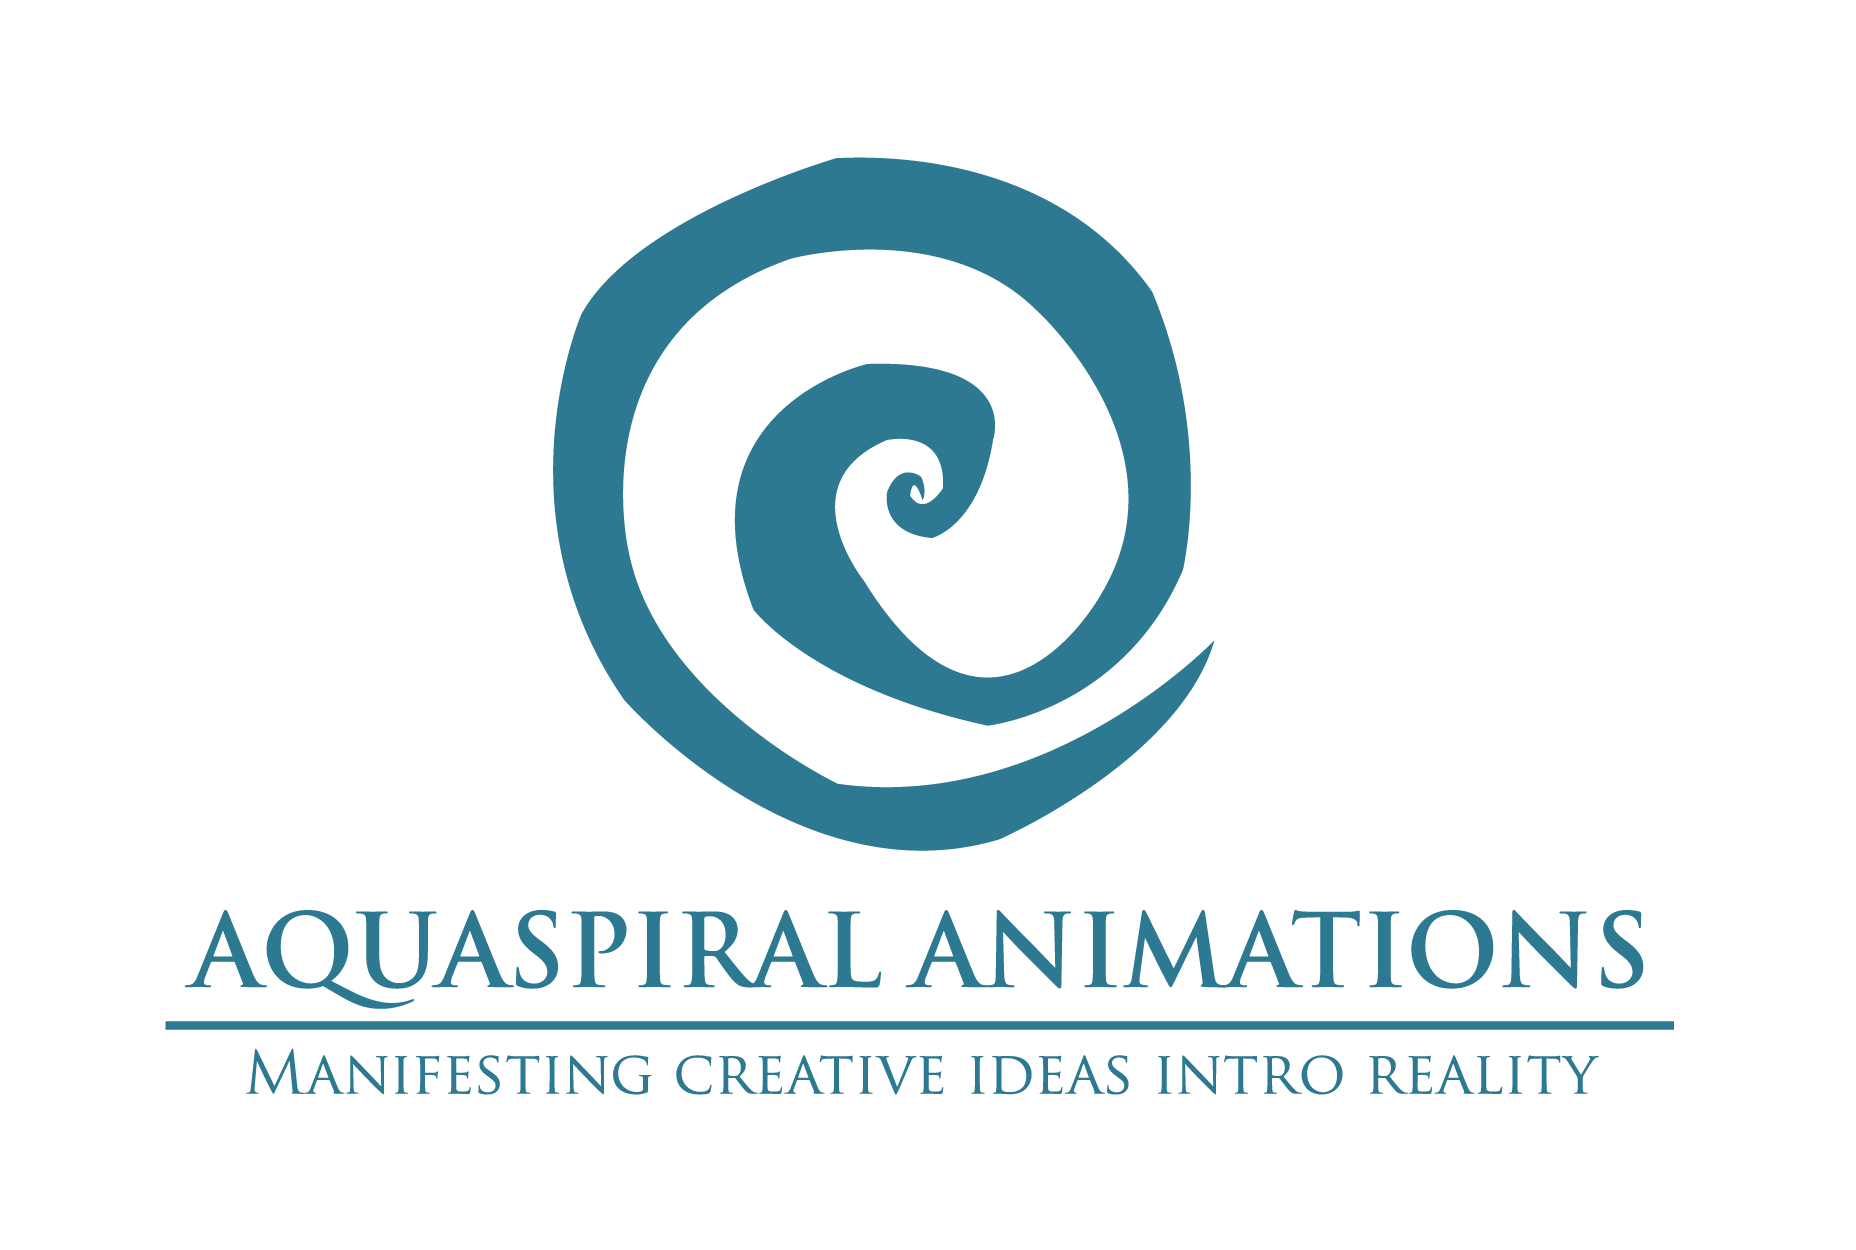 Welcome to Aquaspiral